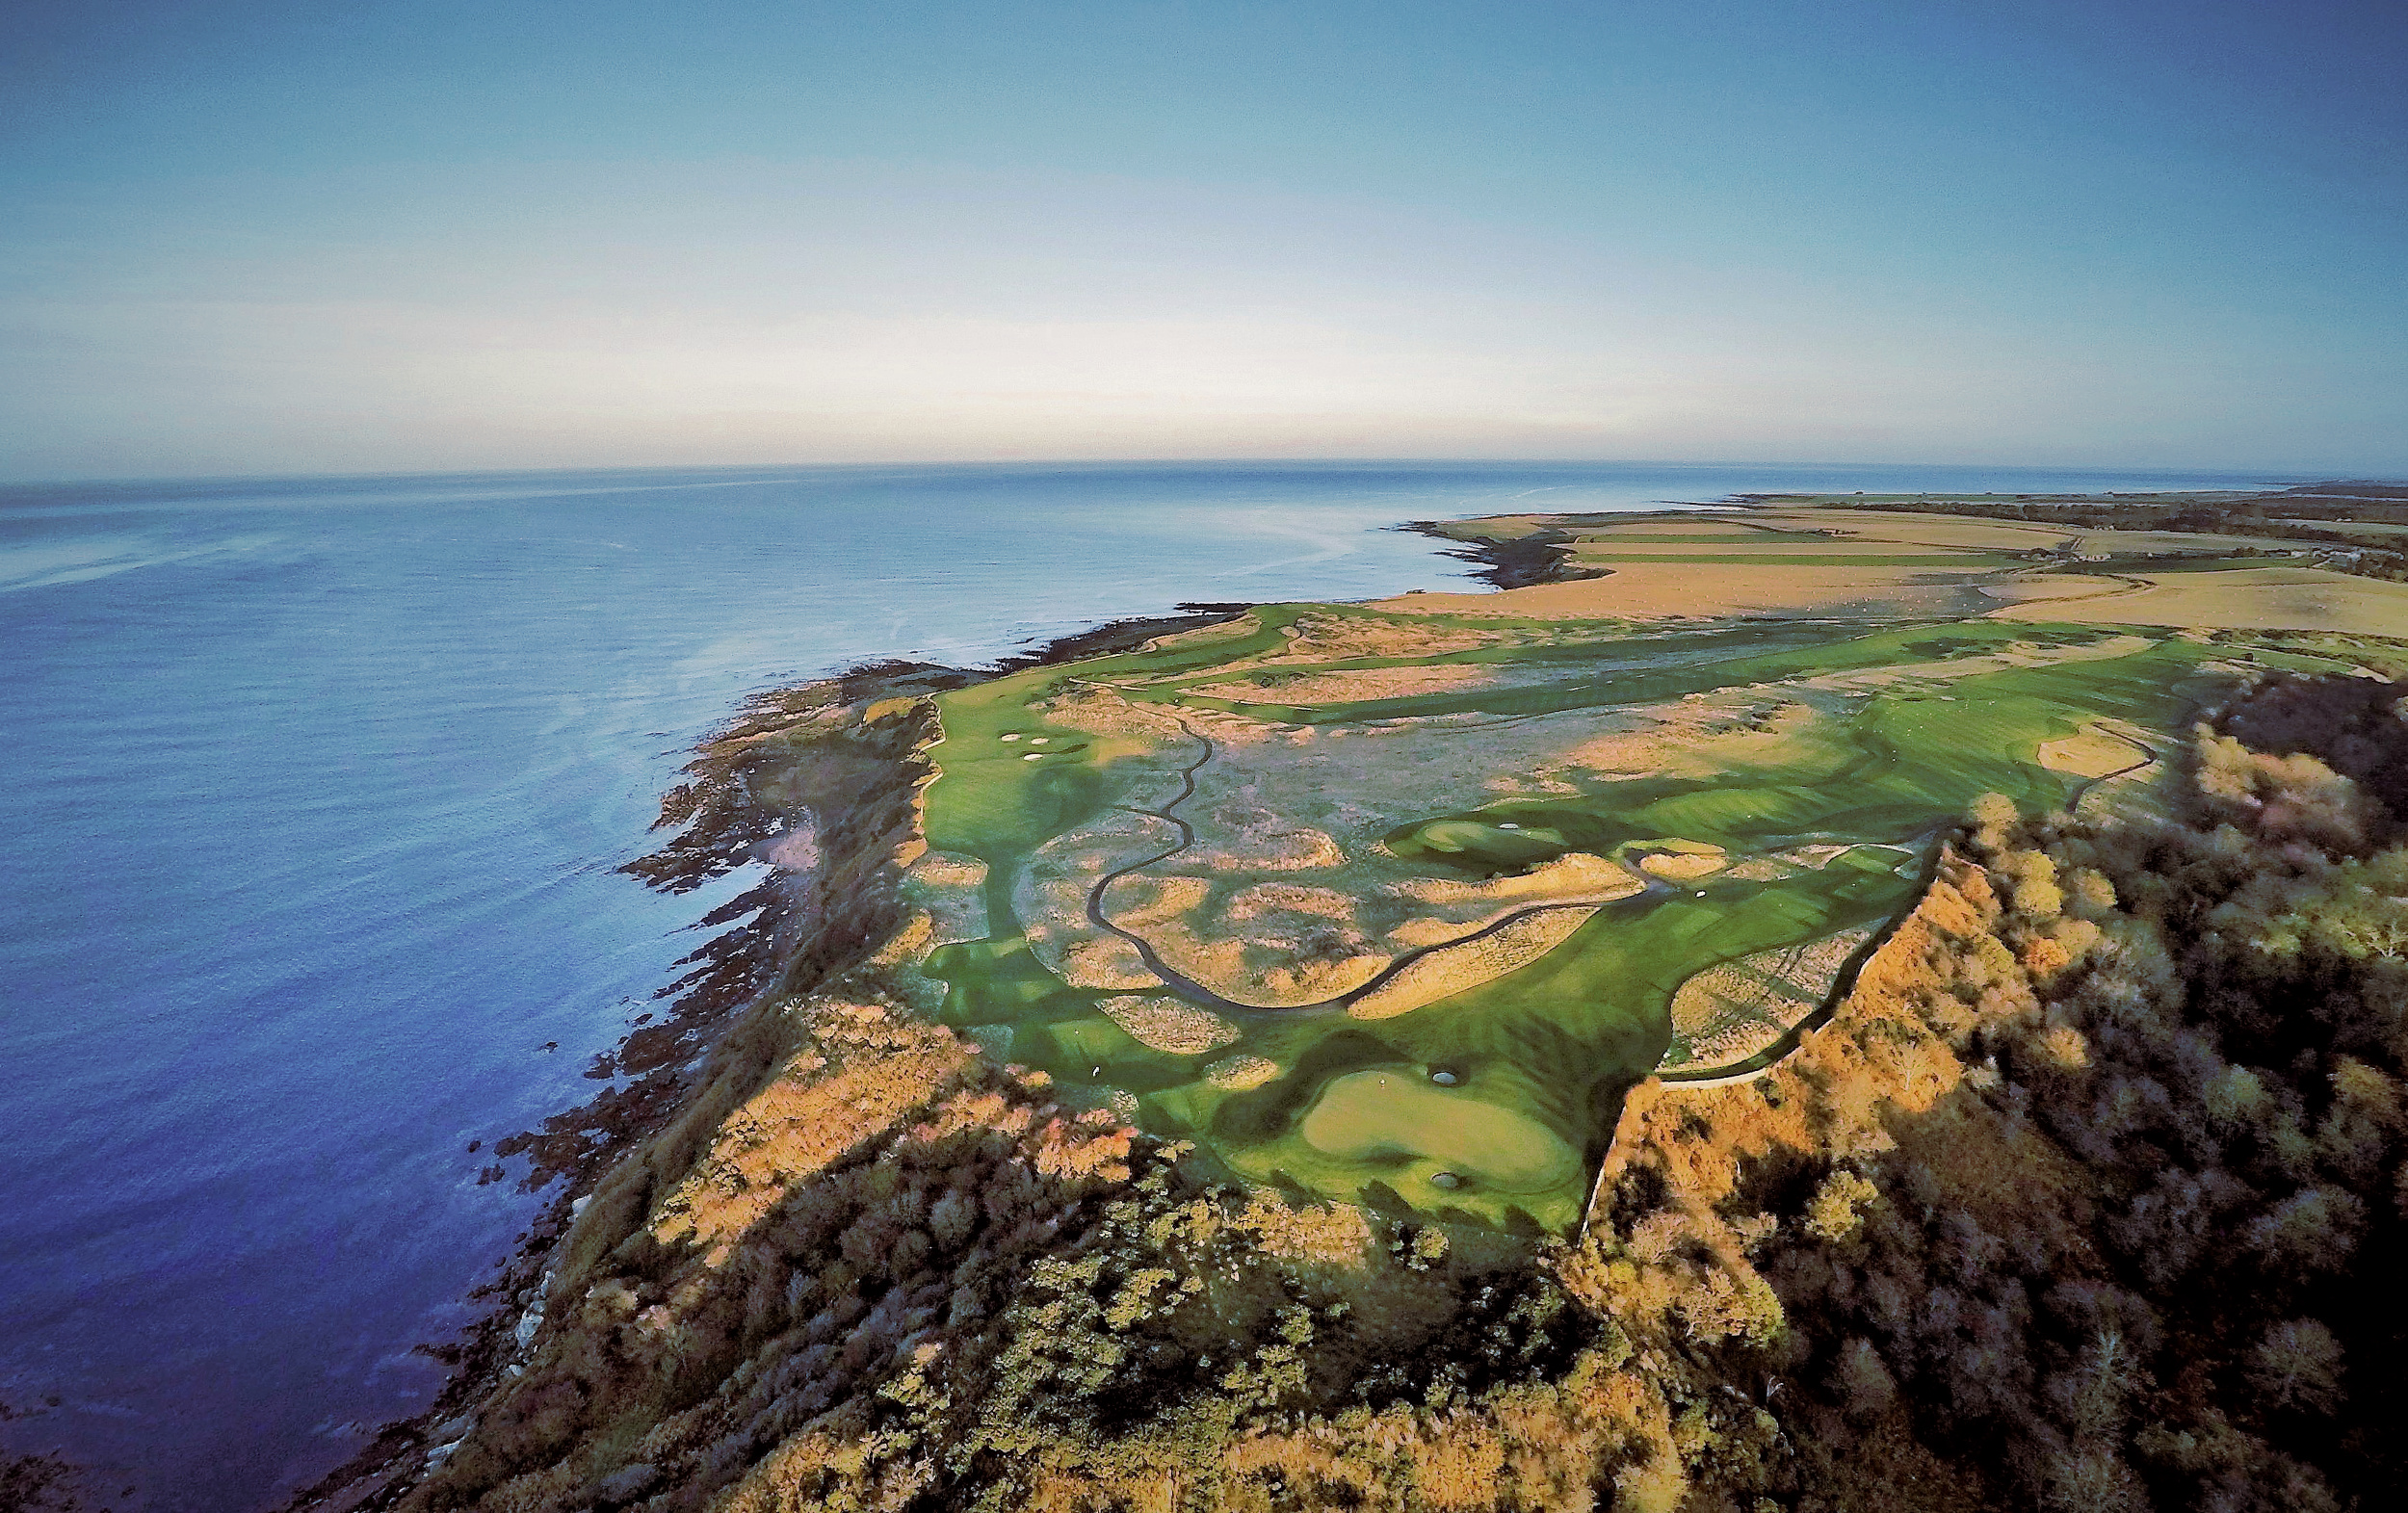 Cover of golf event named Fairmont Senior's Open - October